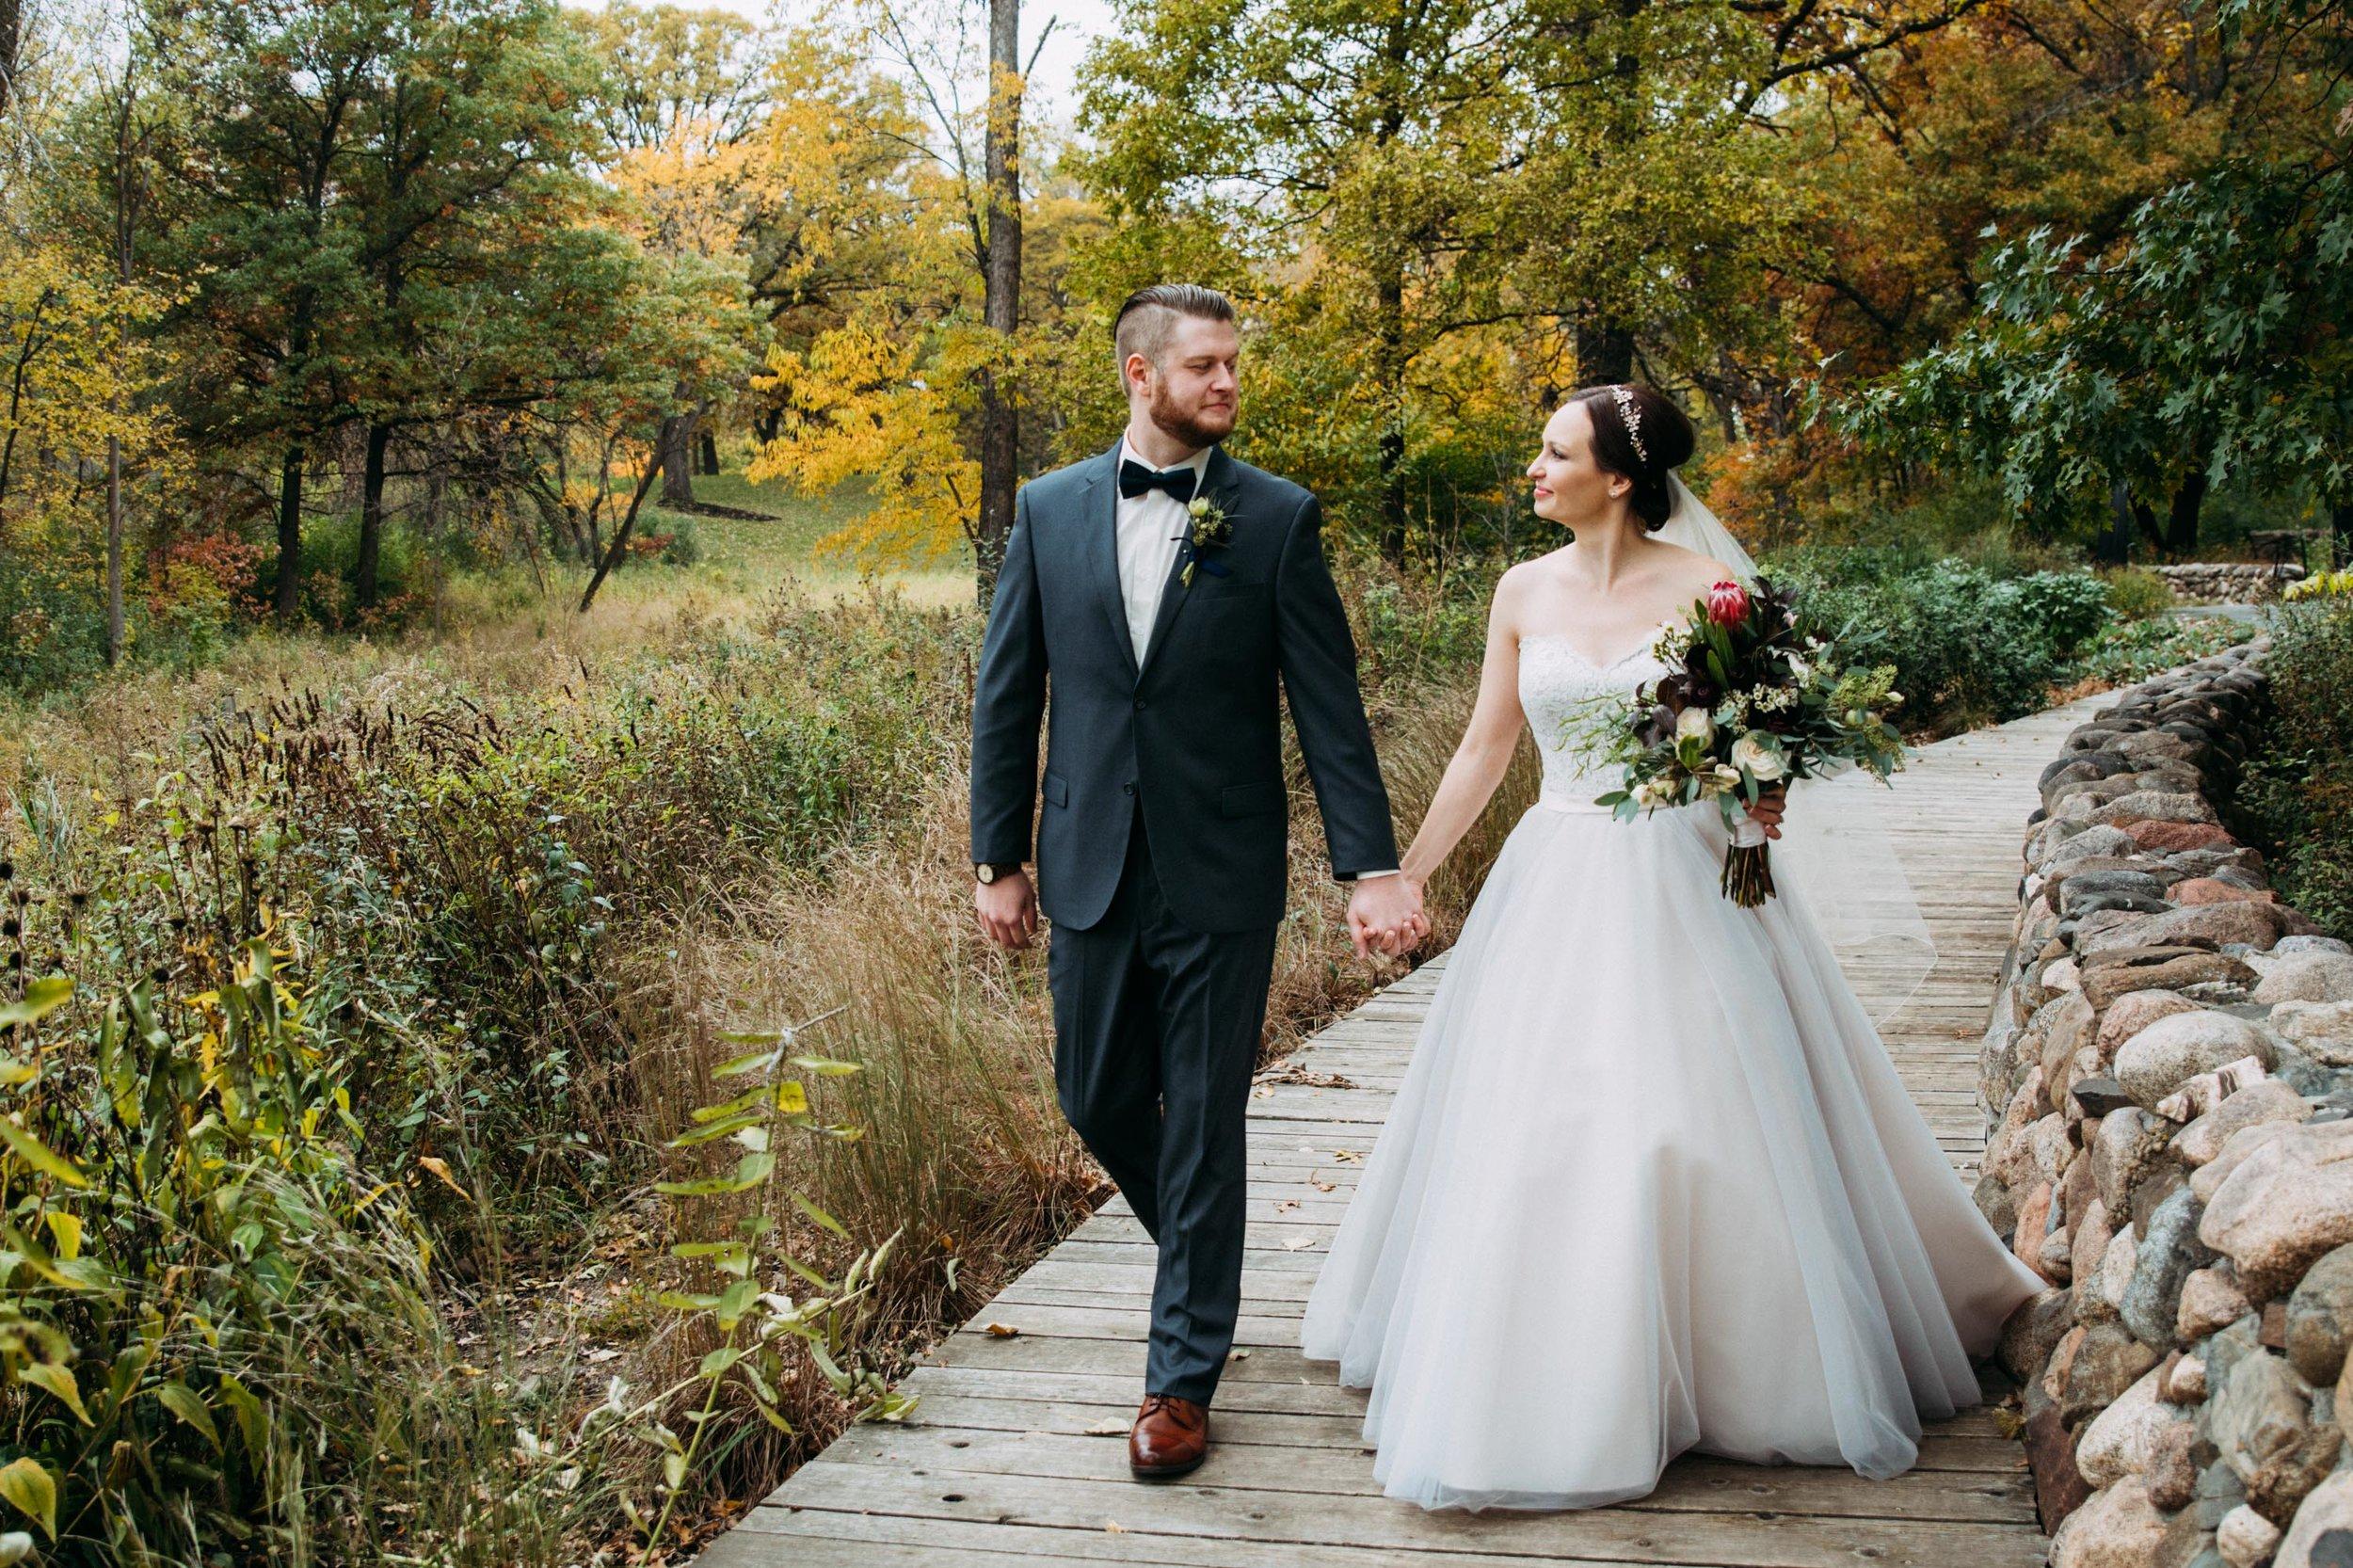 11-Sara_Tom_Bride_Groom_Portraits_Minneapolis_Wedding.jpg